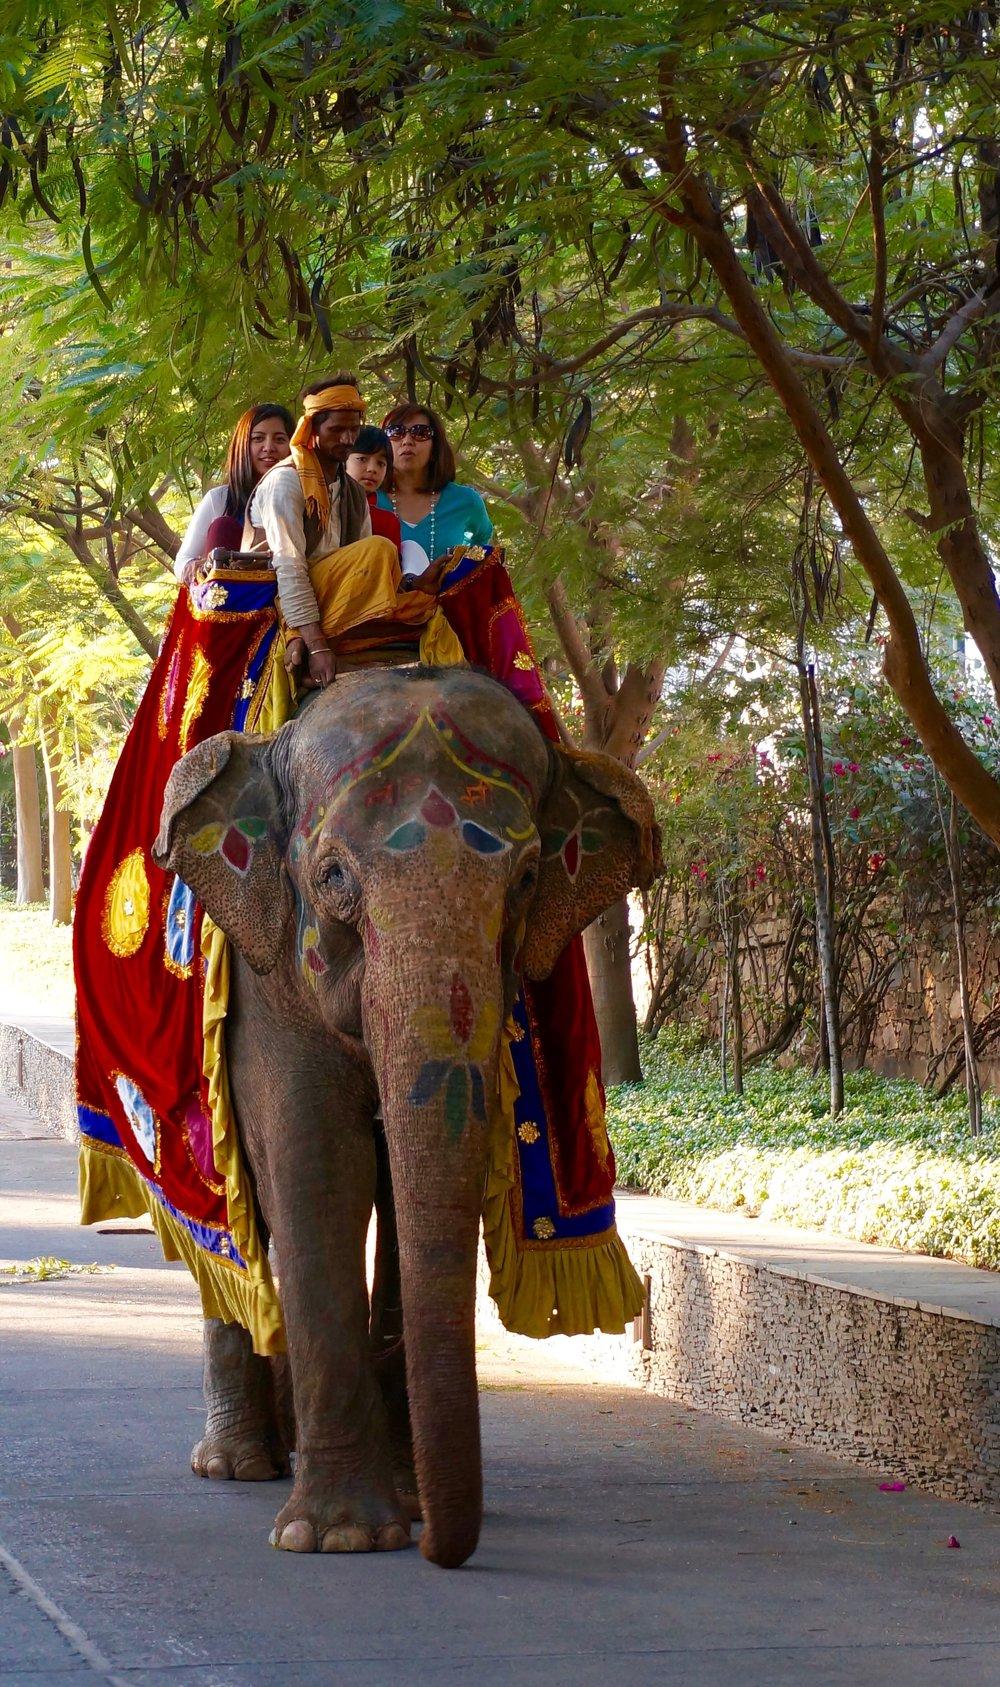 Voyages-de-luxes-asie-Udaipur.jpg